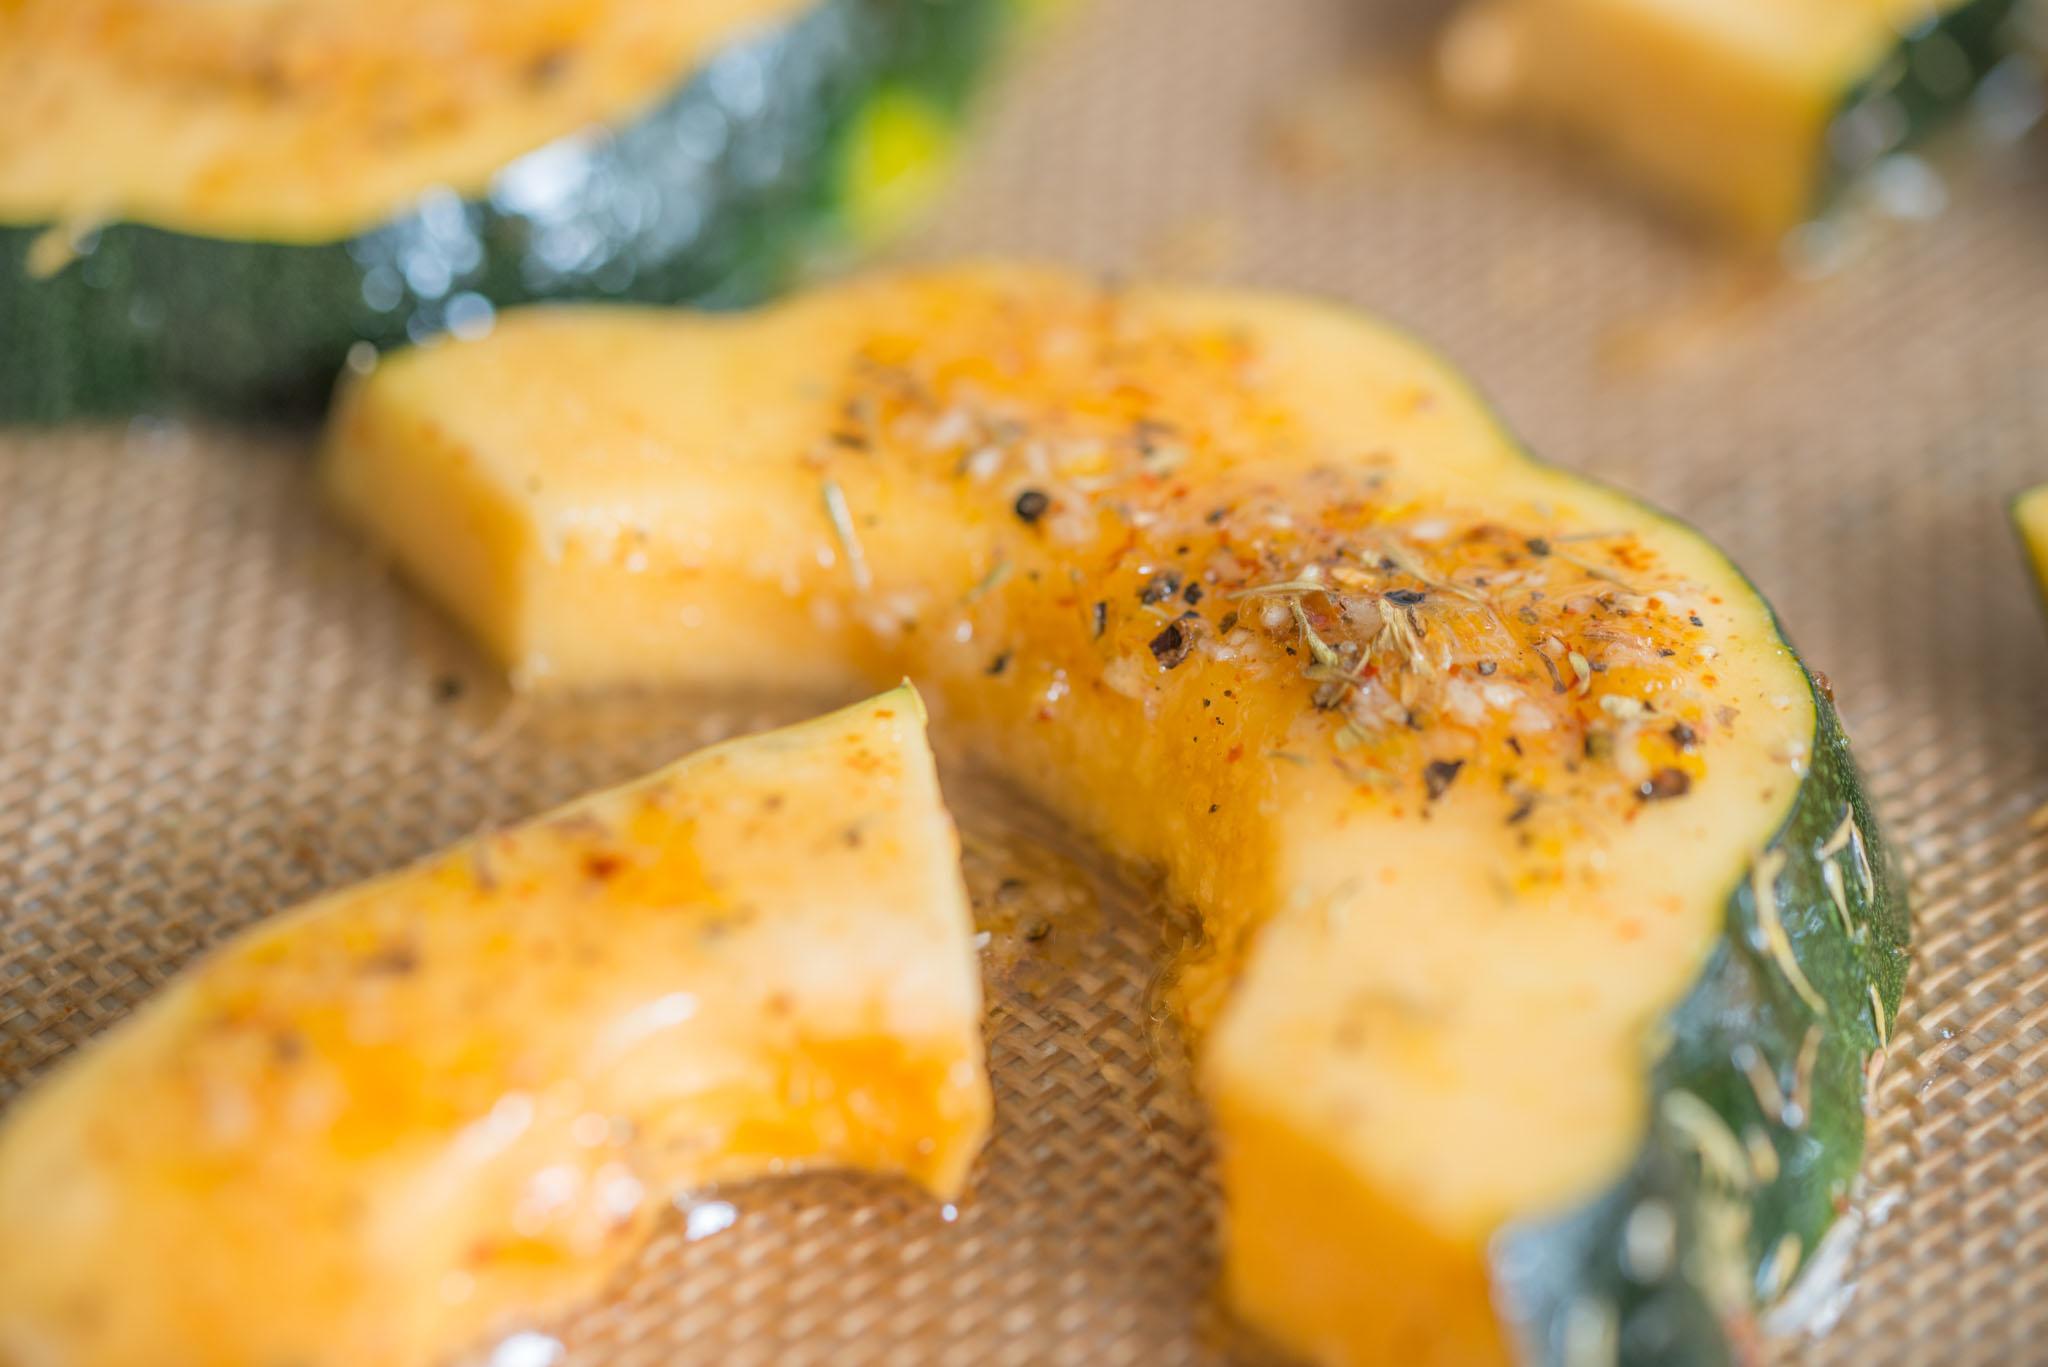 Mixed & Measured | Acorn SquashMixed & Measured | Parmesan Crusted Acorn Squash